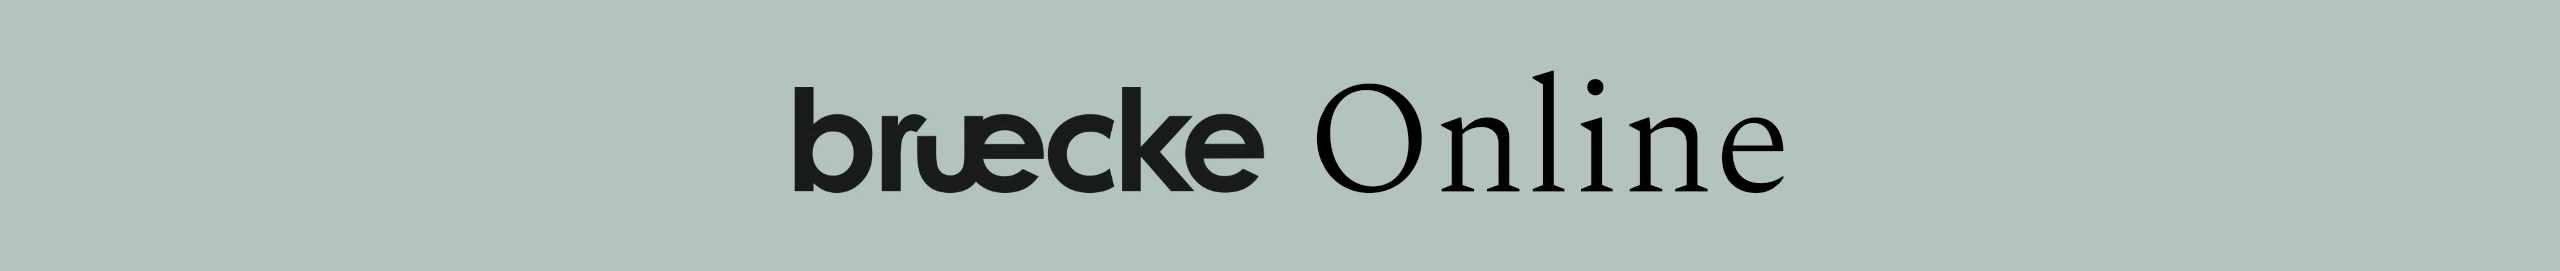 bruecke Online